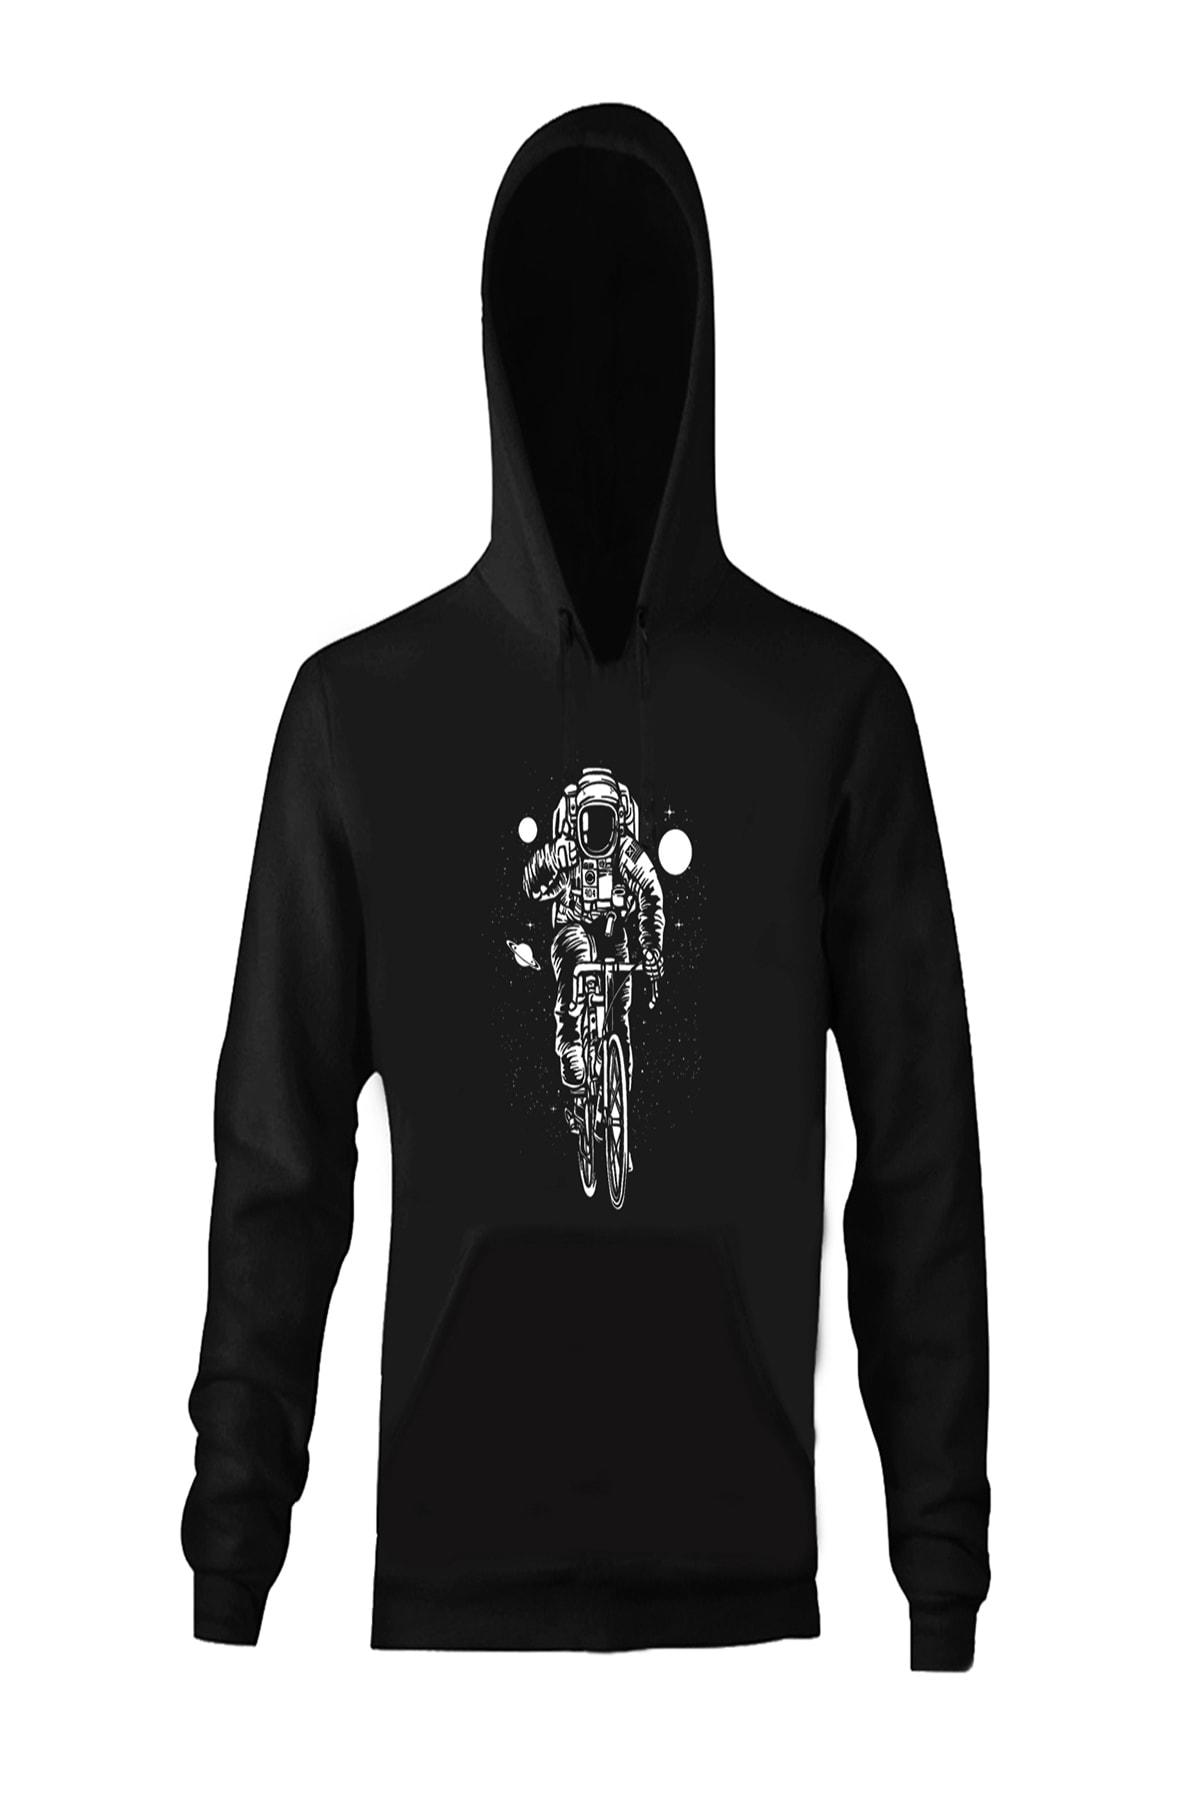 Cycling In Space Baskılı Tasarım Unisex Sweatshirt